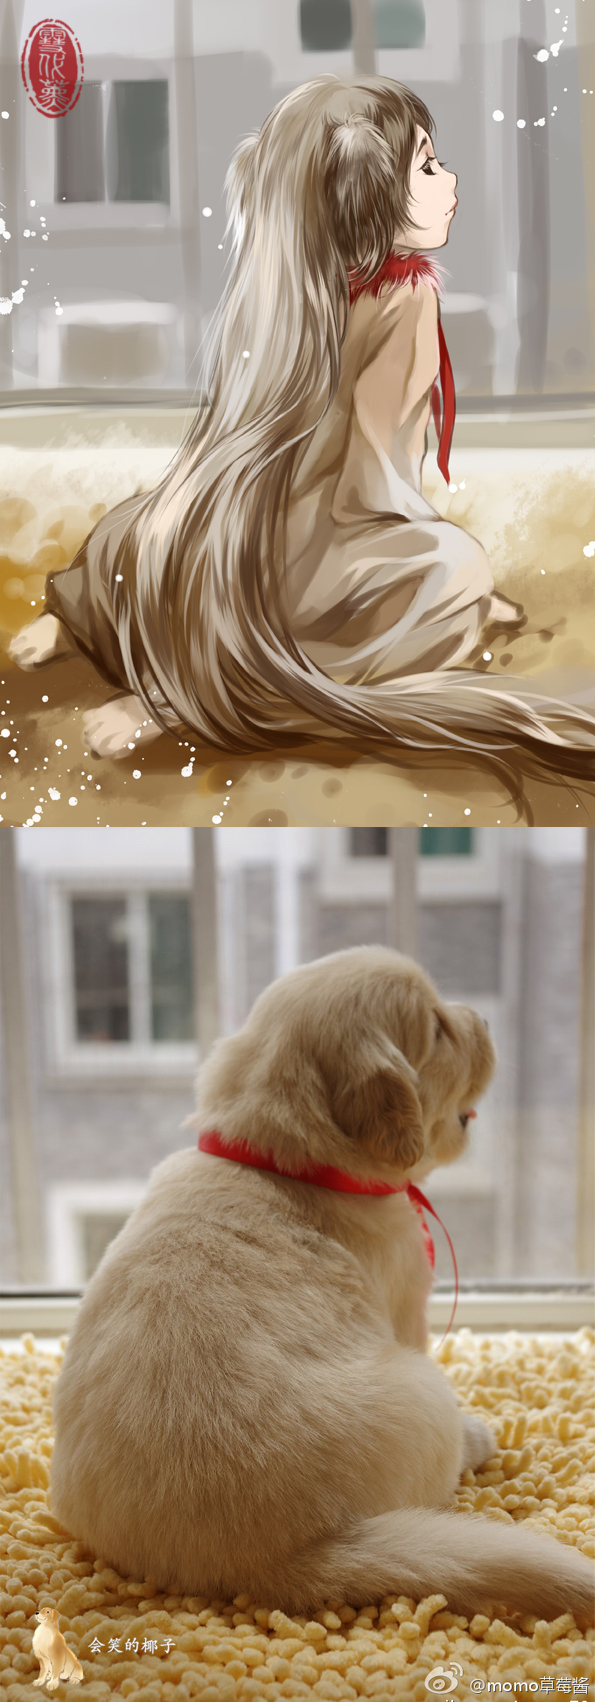 Tags: Anime, Xuedaixun, Pixiv, Original, Inspiration By Photo, Photograph (Source)